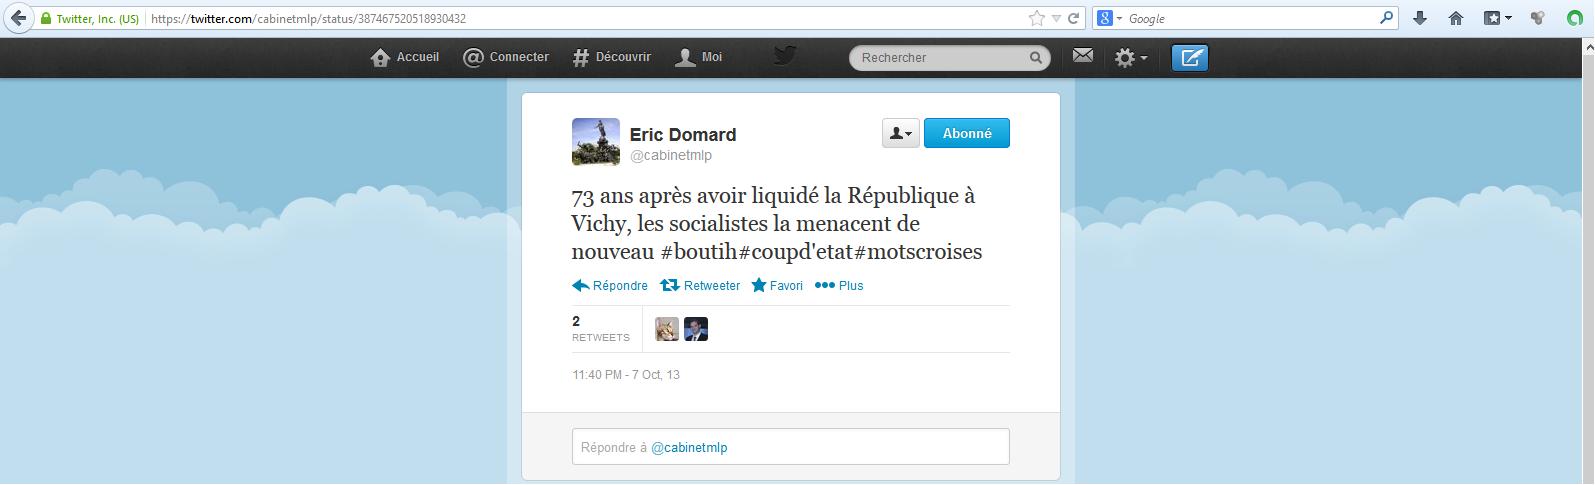 Eric-Domard-7-10-13-Les-socialistes-et-Vichy